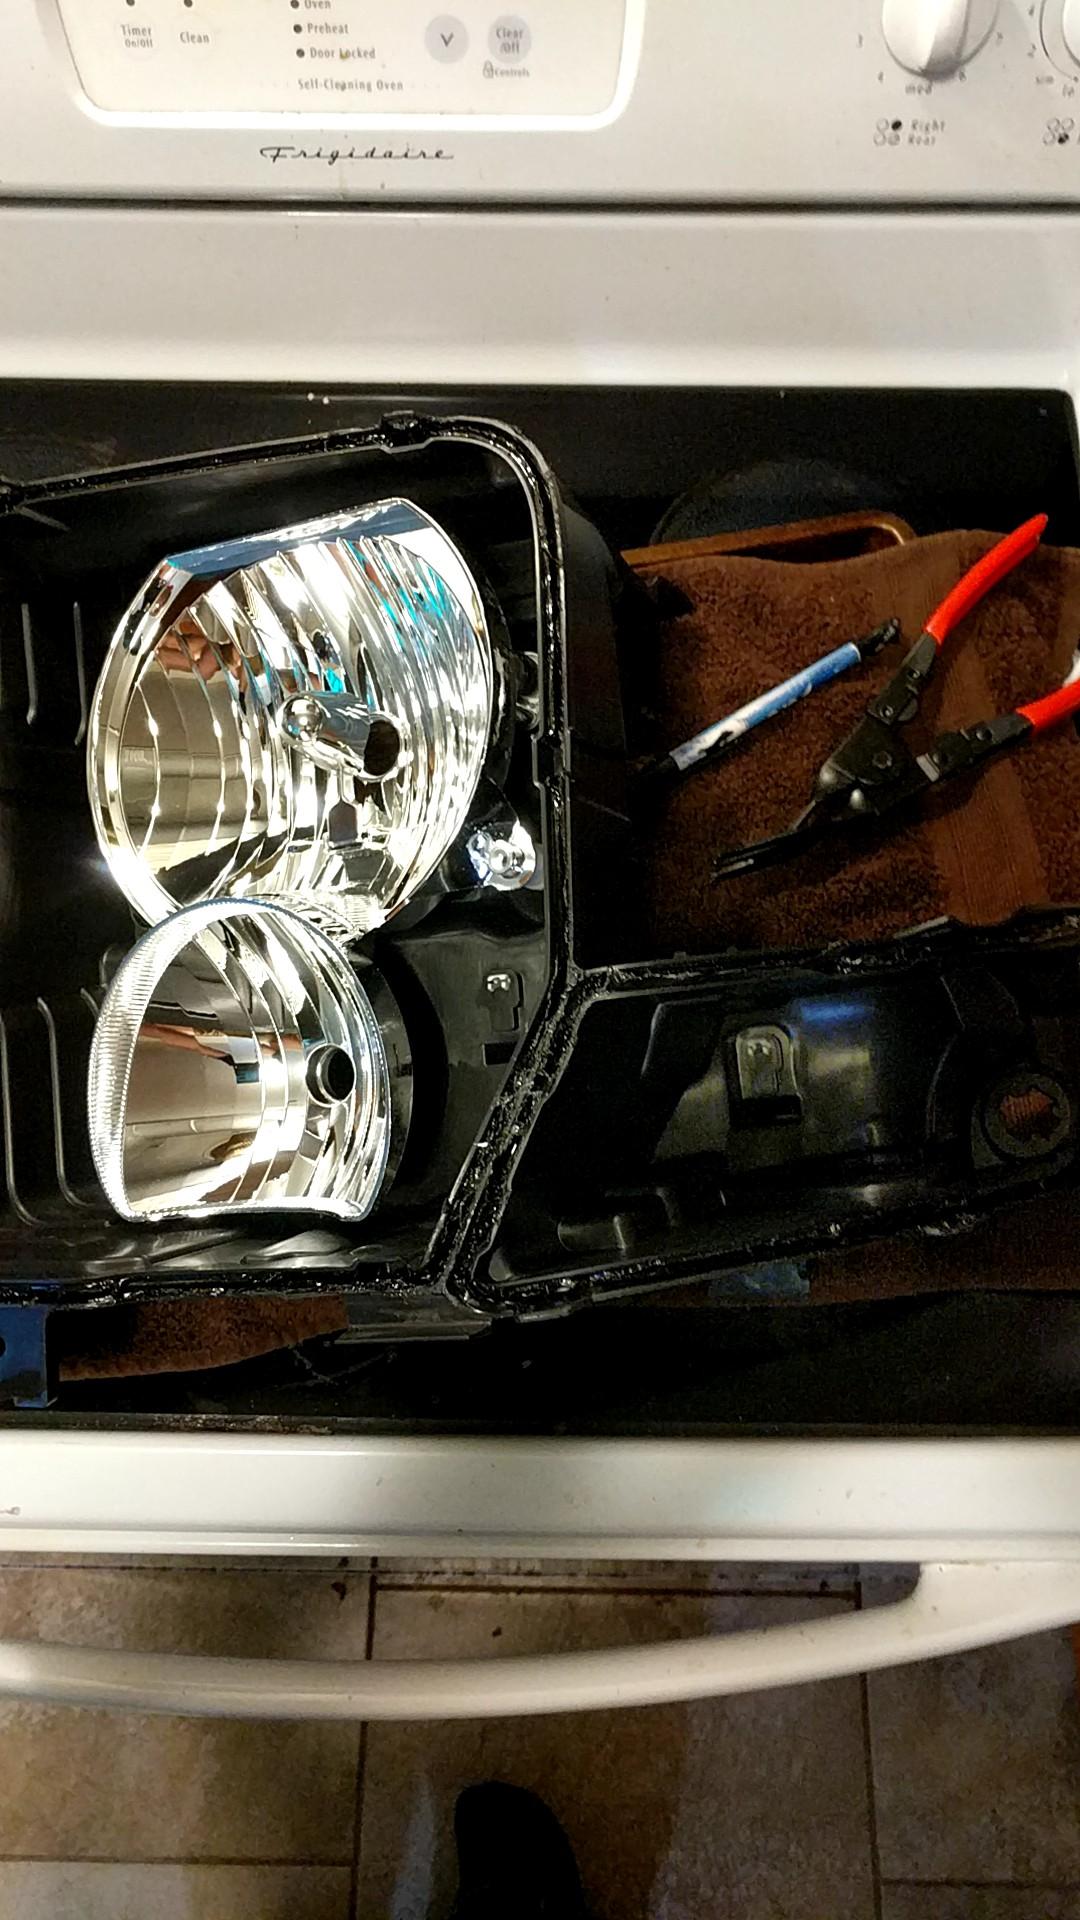 jeep commander headlight wiring - wiring diagram fame-silverado-b -  fame-silverado-b.disnar.it  disnar.it